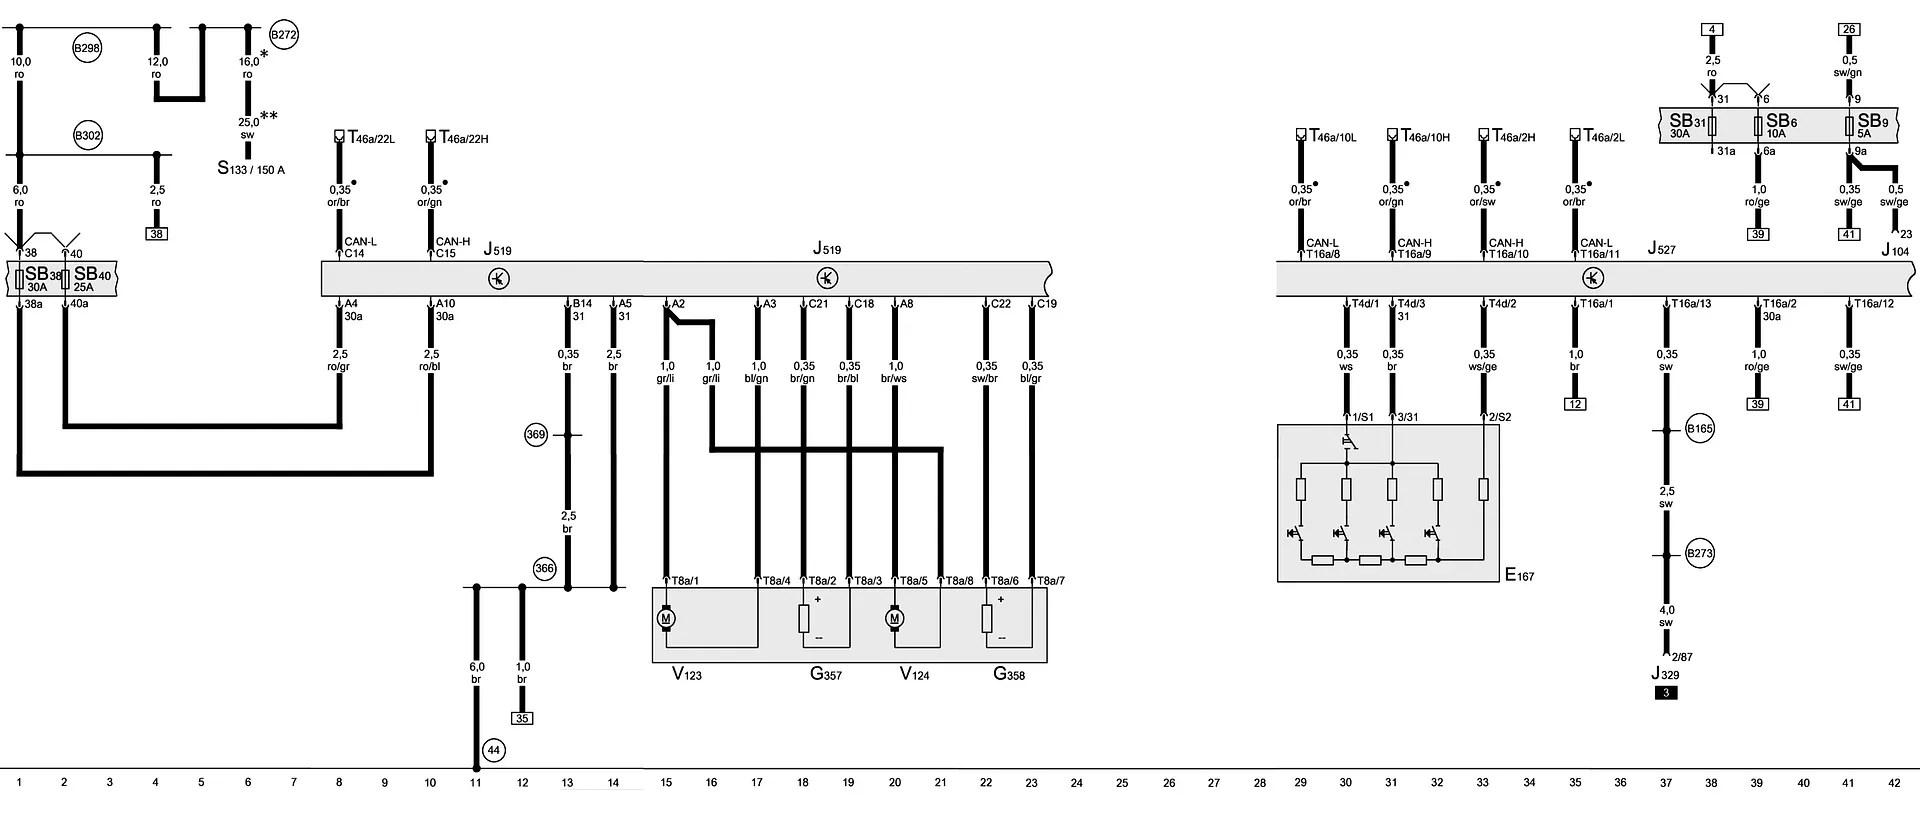 A8electriccolumn_zps47e86df2?resize=665%2C288 skoda octavia towbar wiring diagram wiring diagram skoda octavia towbar wiring diagram at honlapkeszites.co